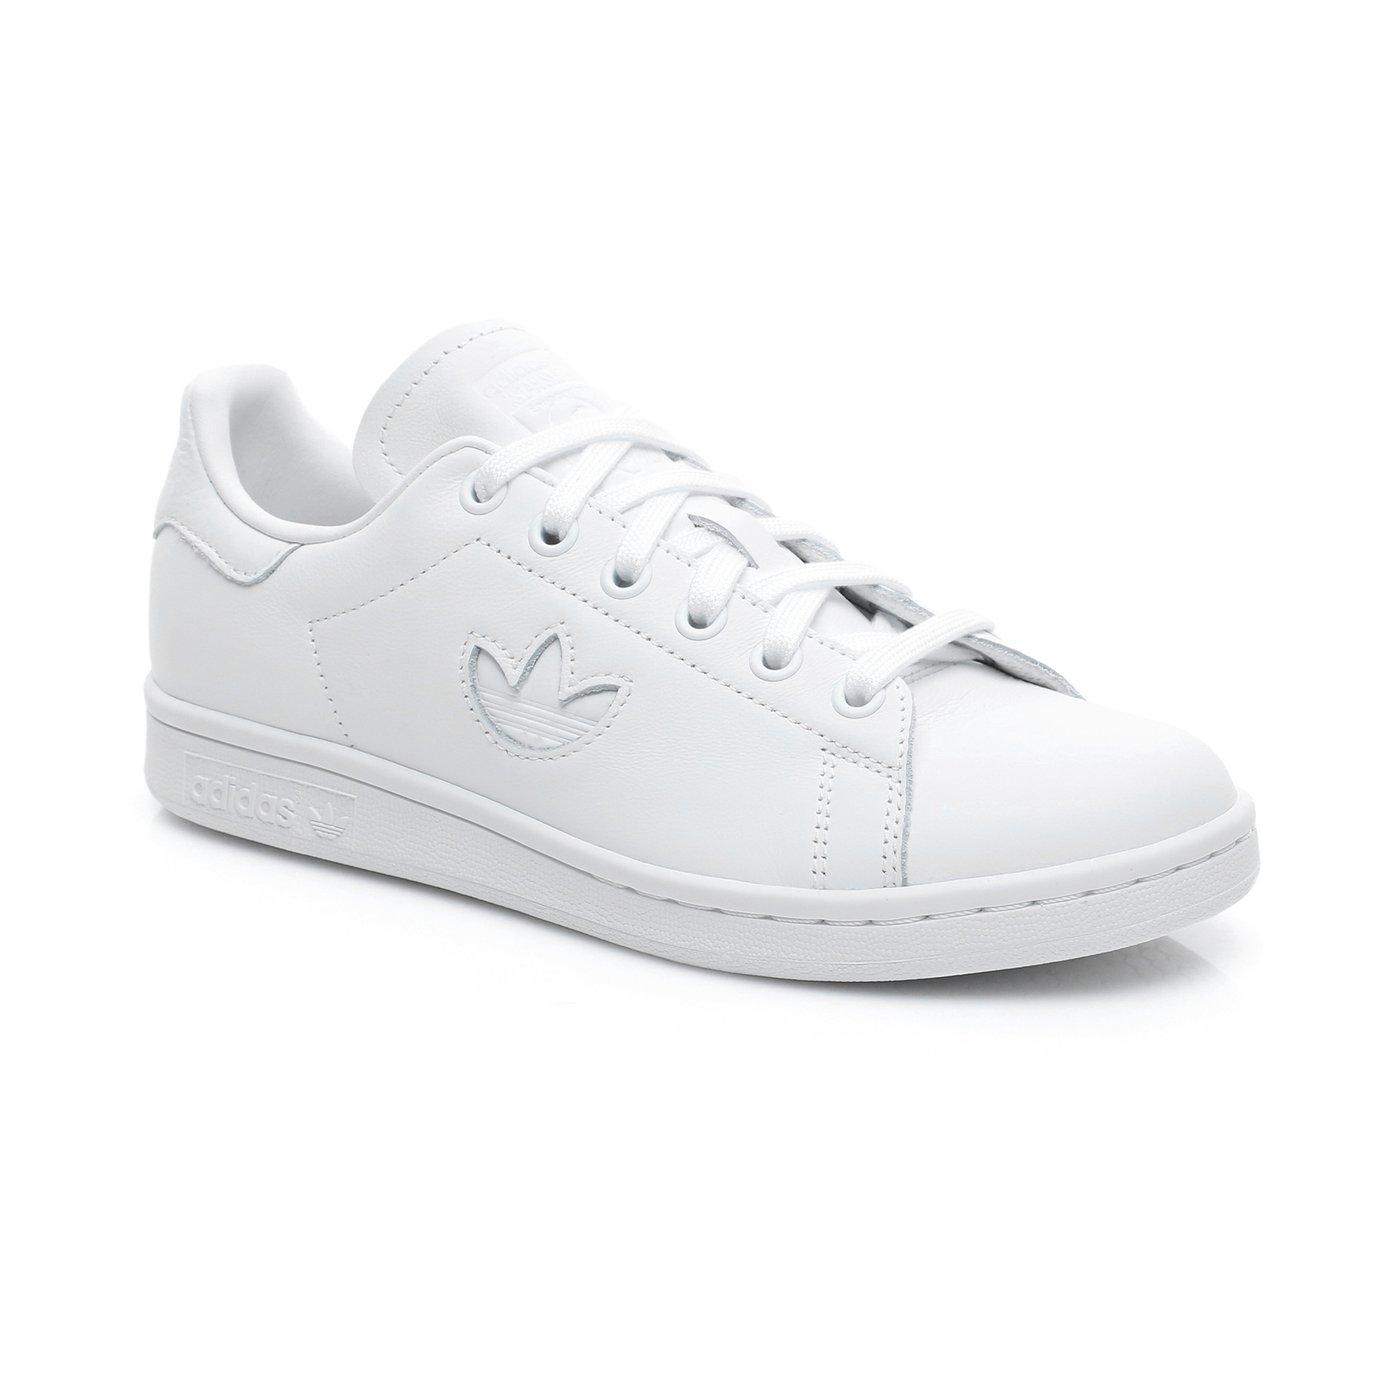 adidas Originals Stan Smith Unisex Beyaz Spor Ayakkabı